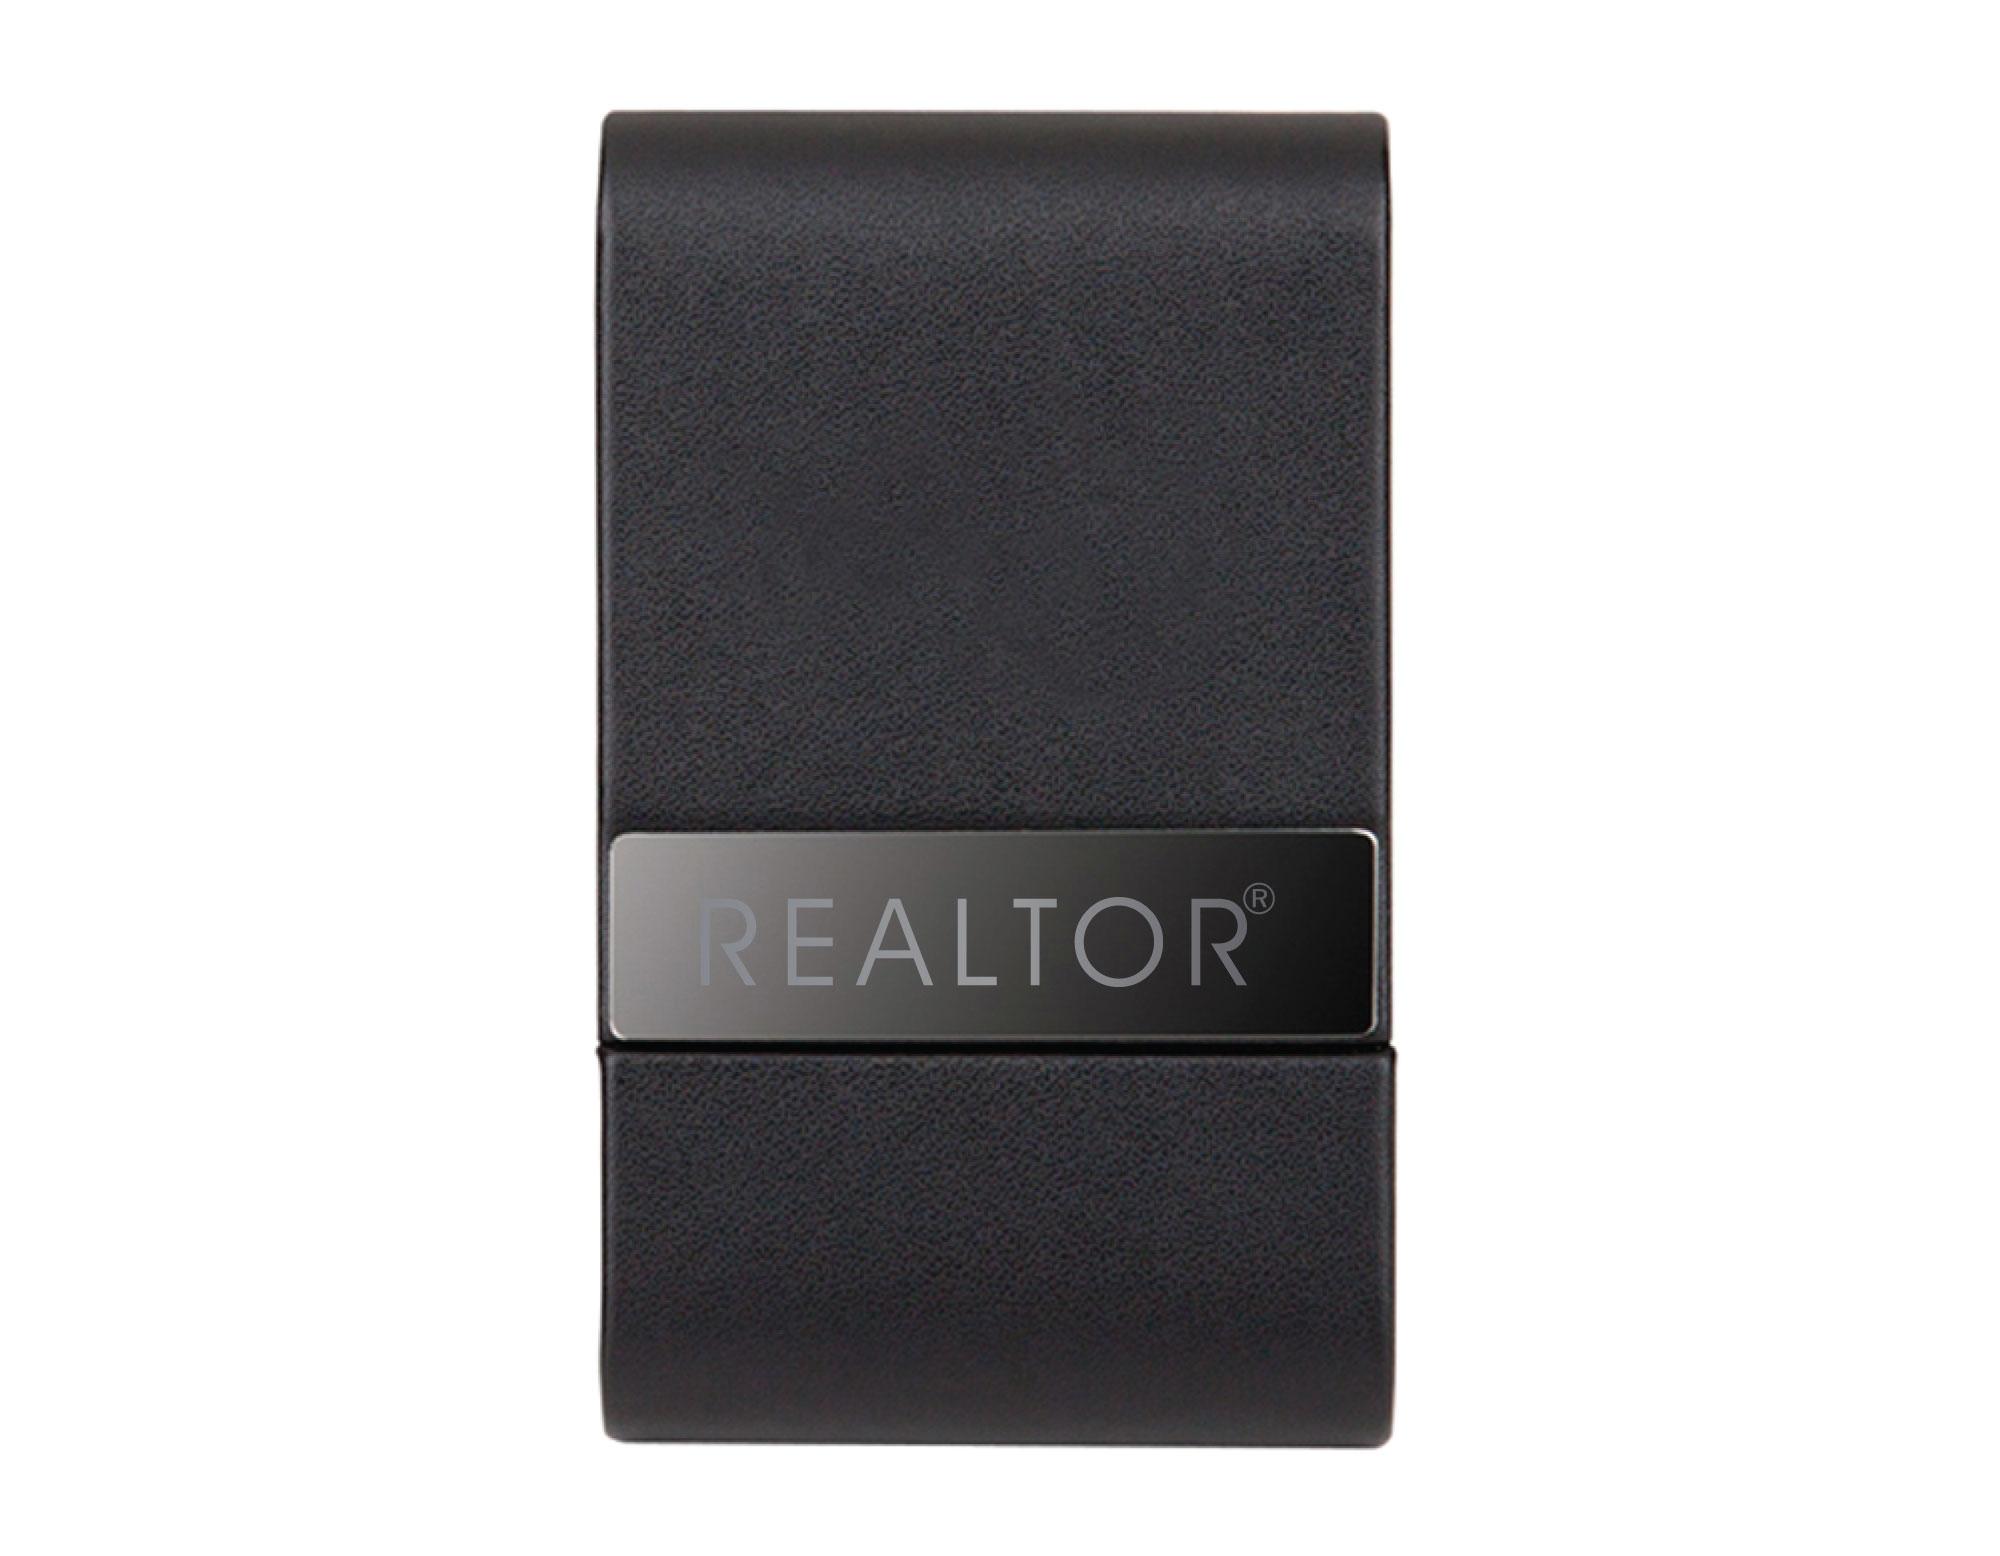 REALTOR® Sleek Business Card Case - Discontinued LJ 12/20/16 (RTS4593)